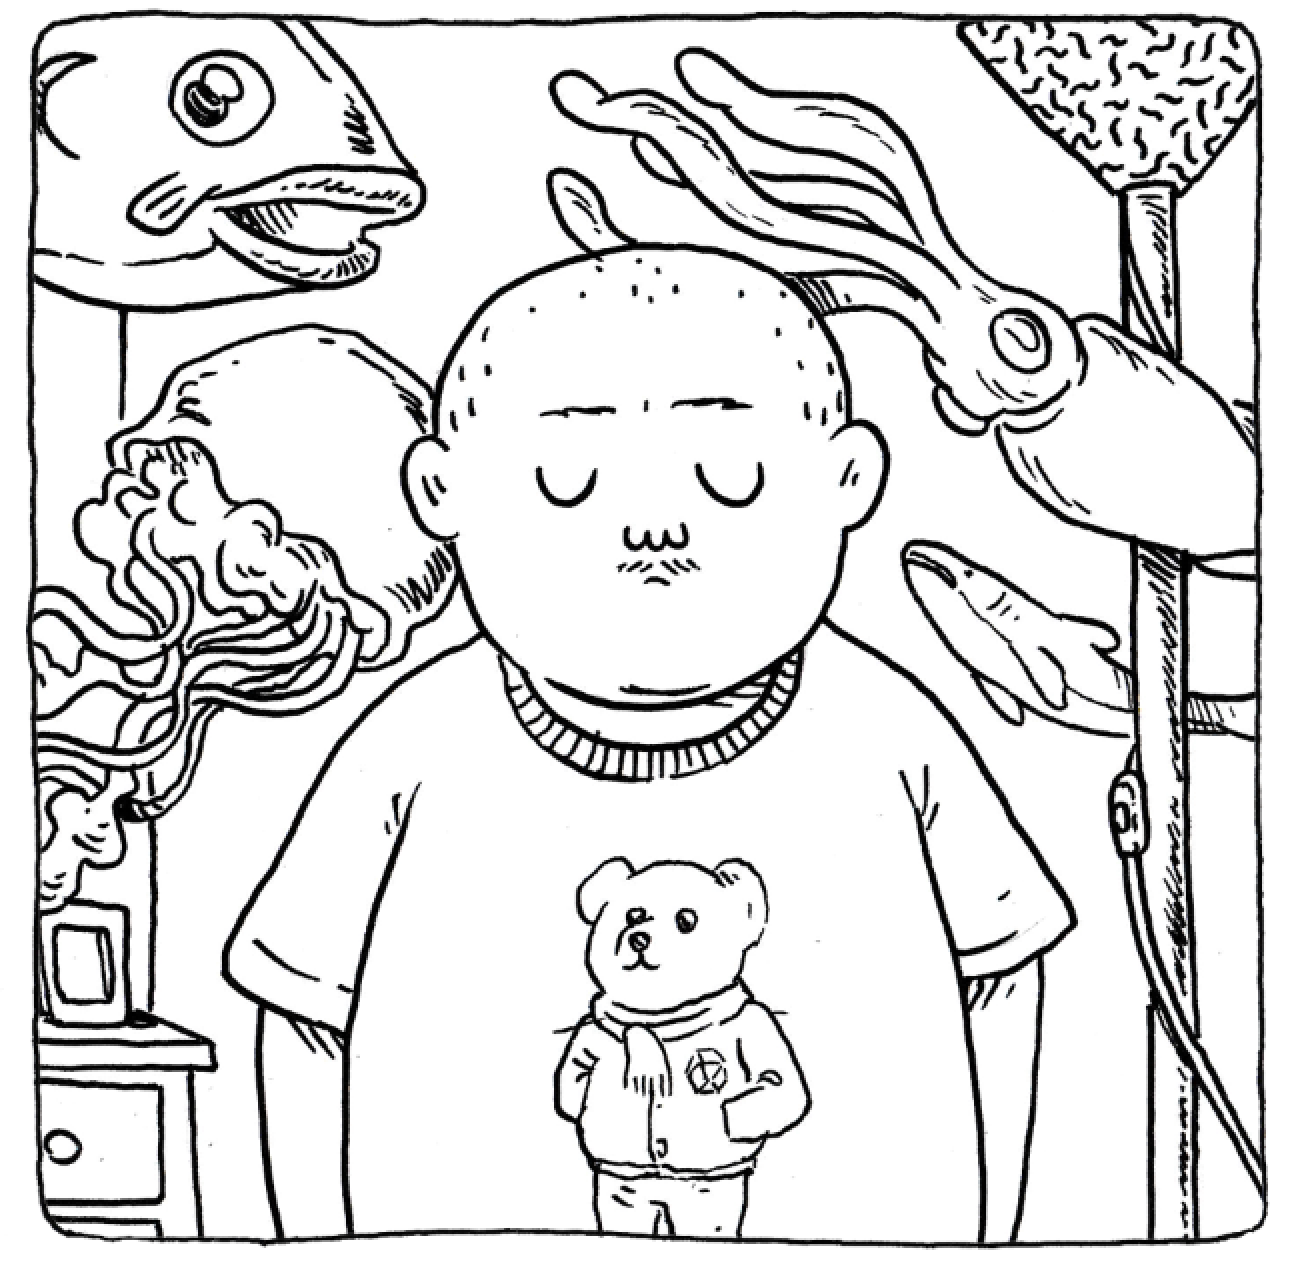 teki-latex-pierre-thyss-meditation-couvre-x-chefs